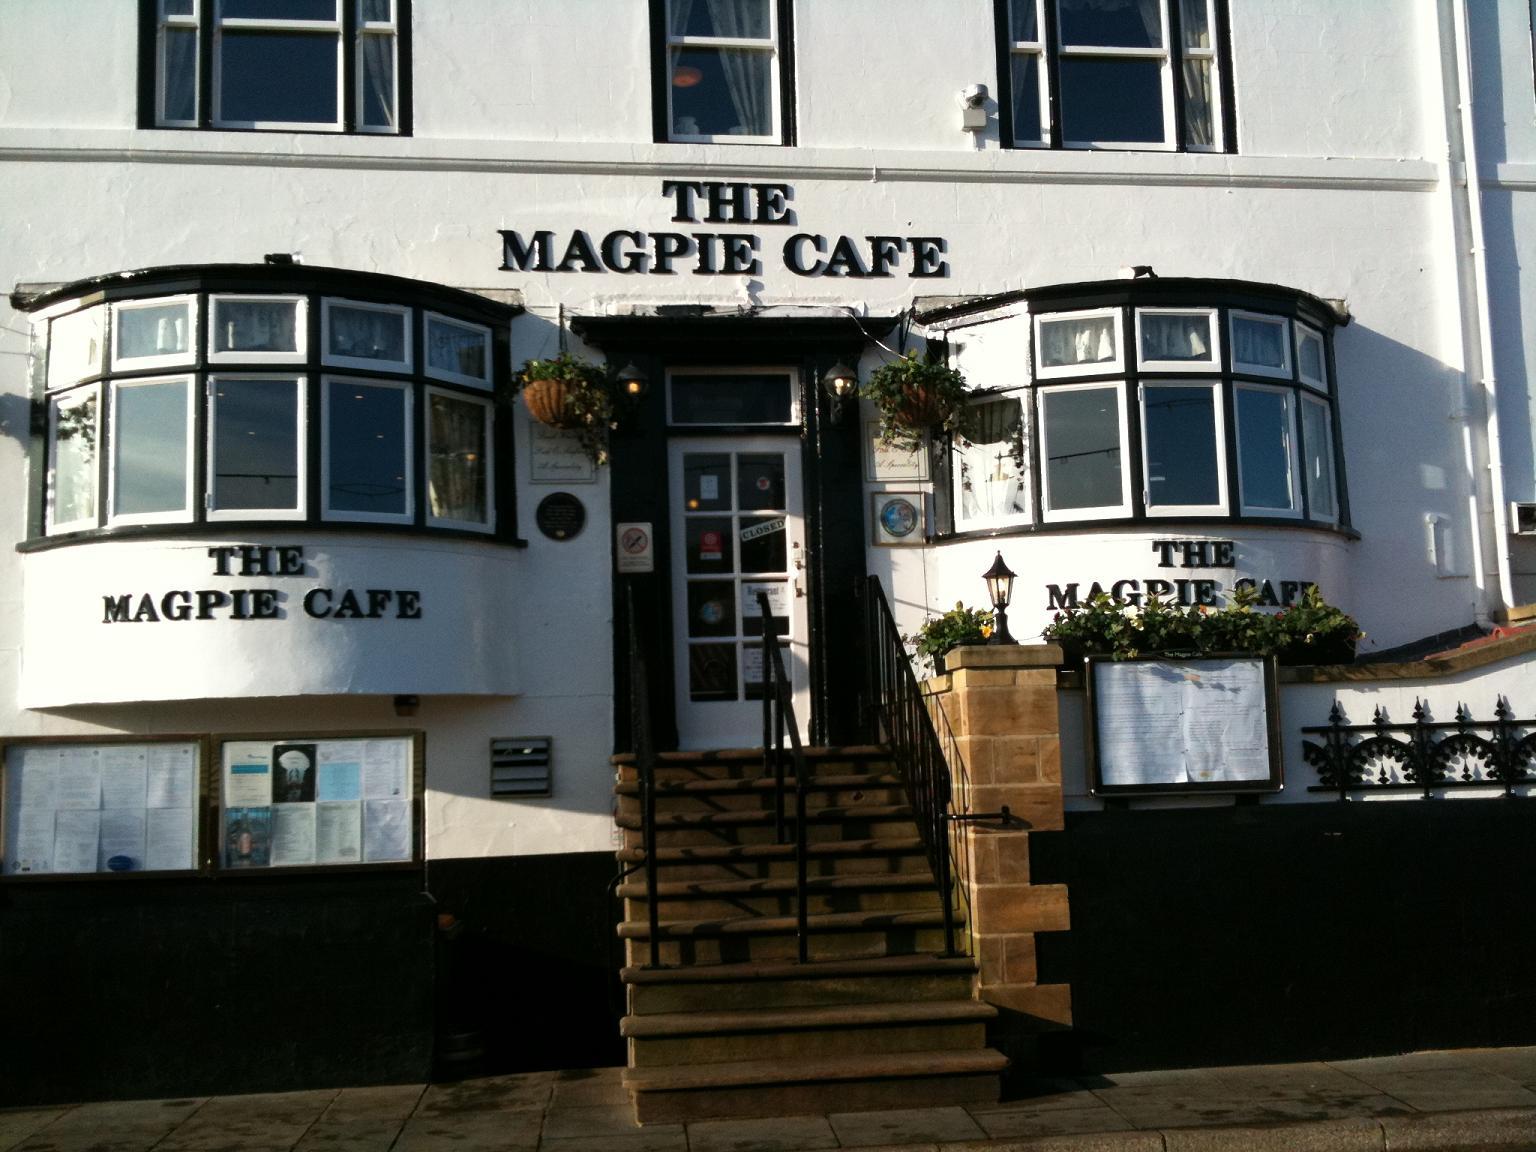 Magpie Café, Whitby